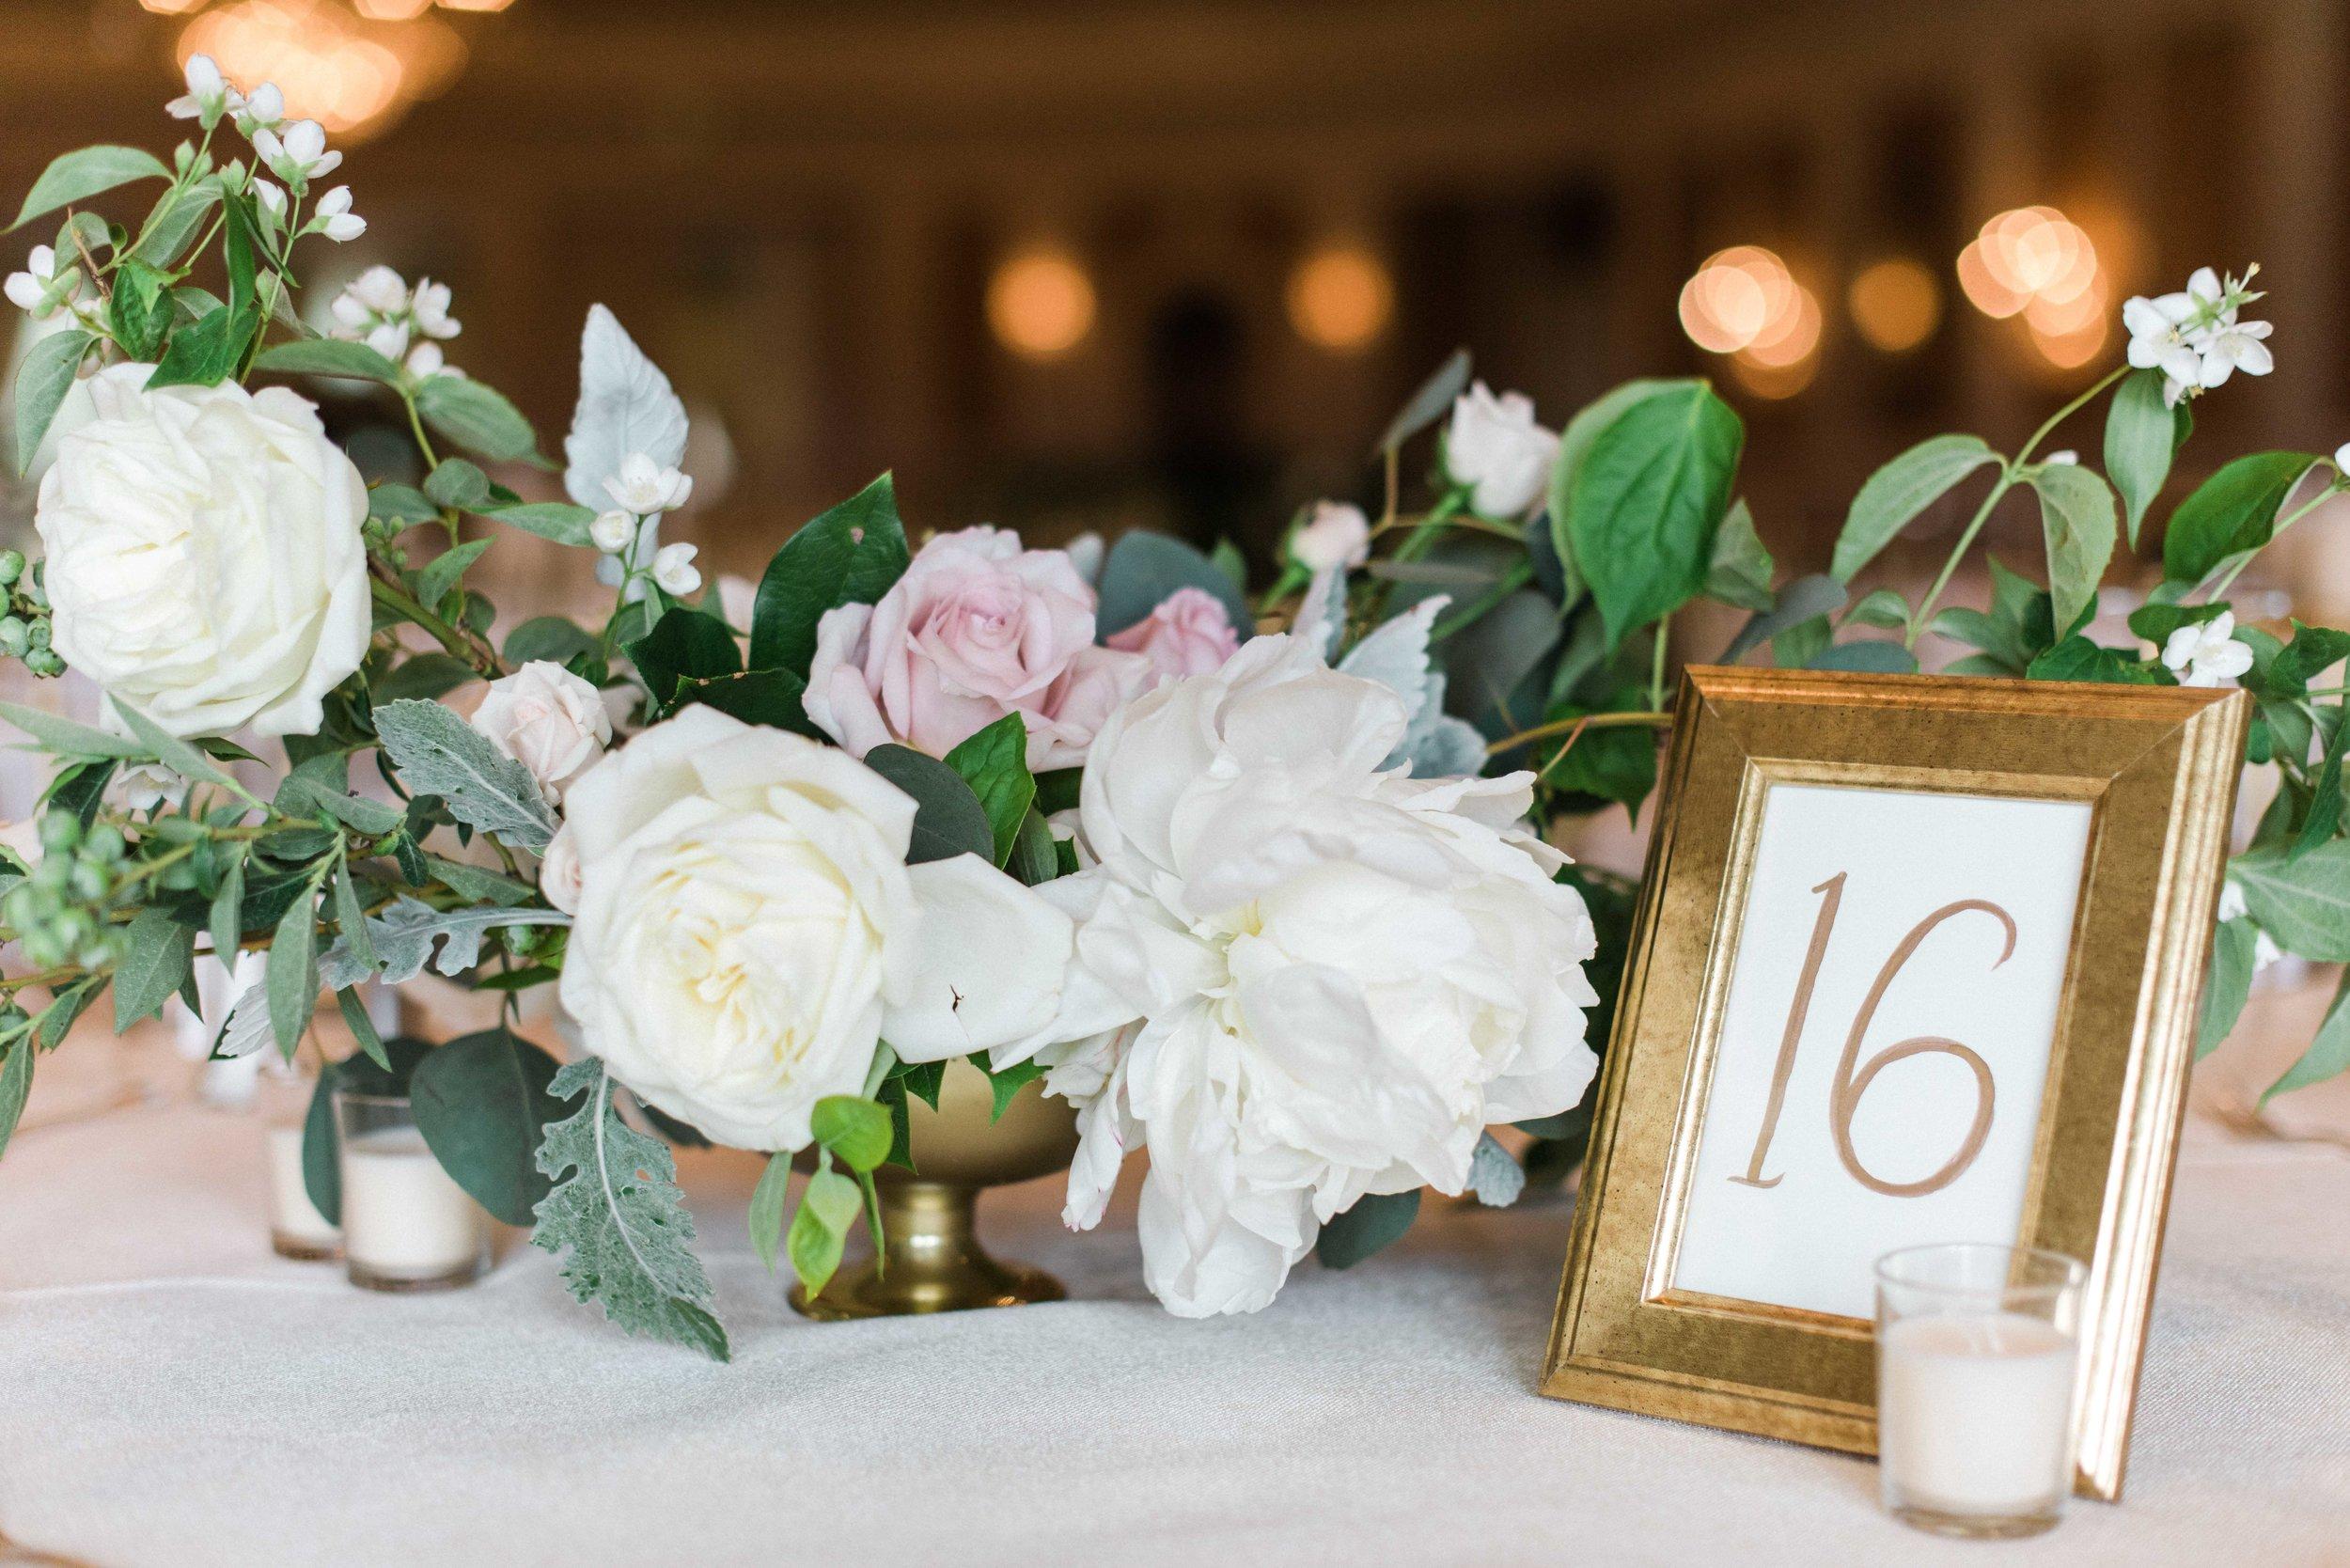 houston-wedding-planner-fine-art-luxury-designer-top-best-destination-austin-dallas-kelly-doonan-events-river-oaks-country-club-134